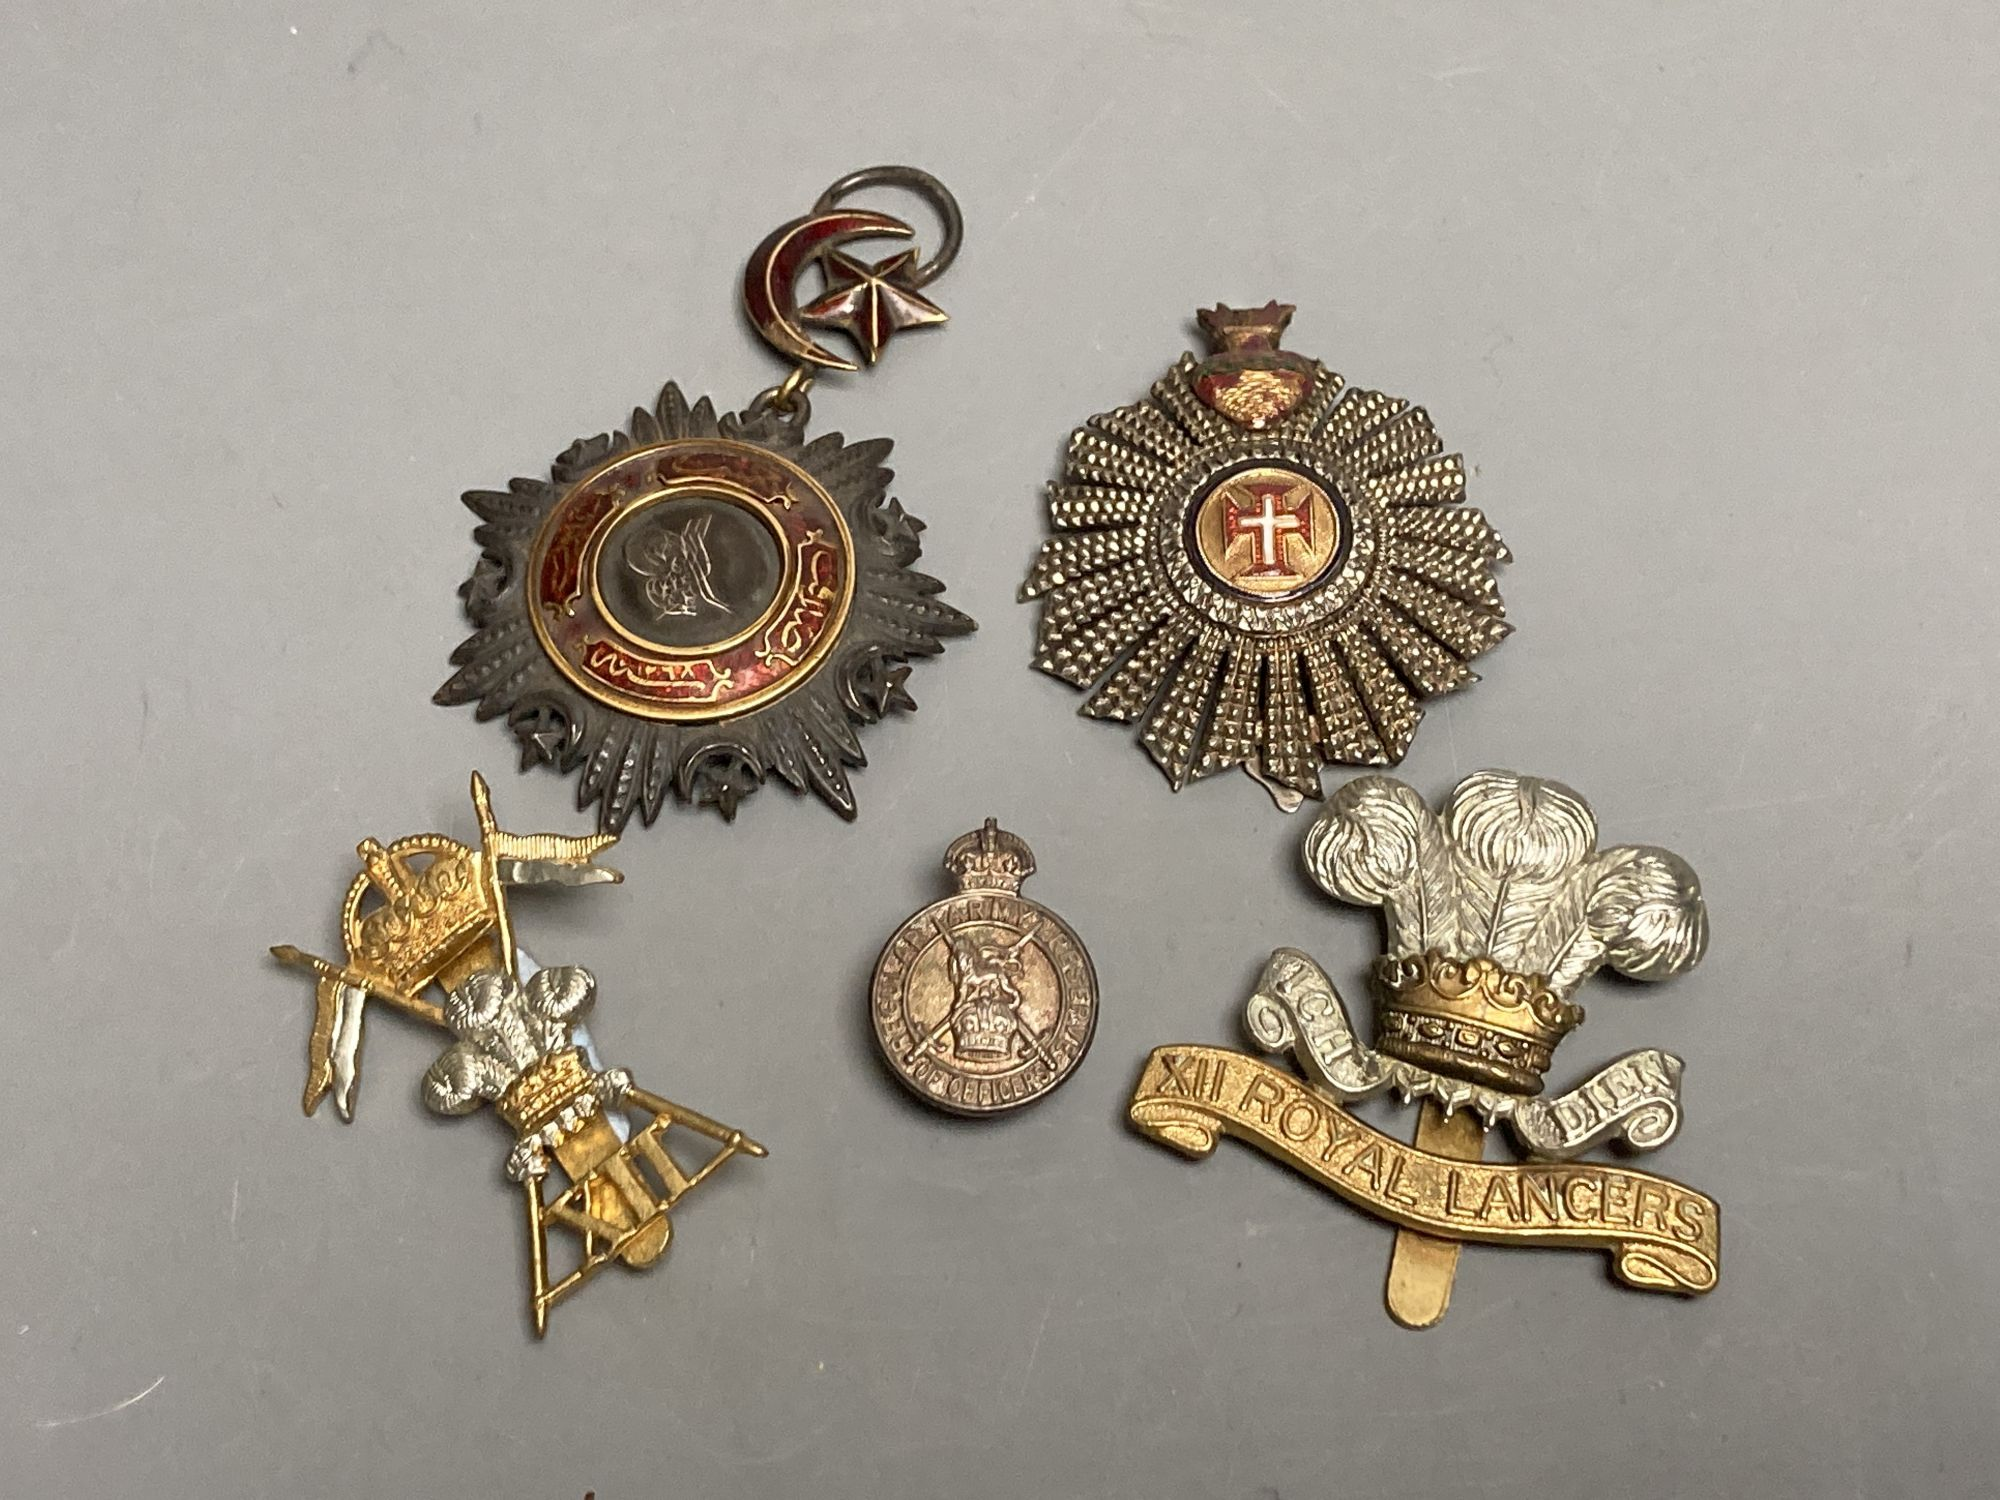 A Turkish Ottoman Order Medjidie Knights Star, another star and three English regimental badges